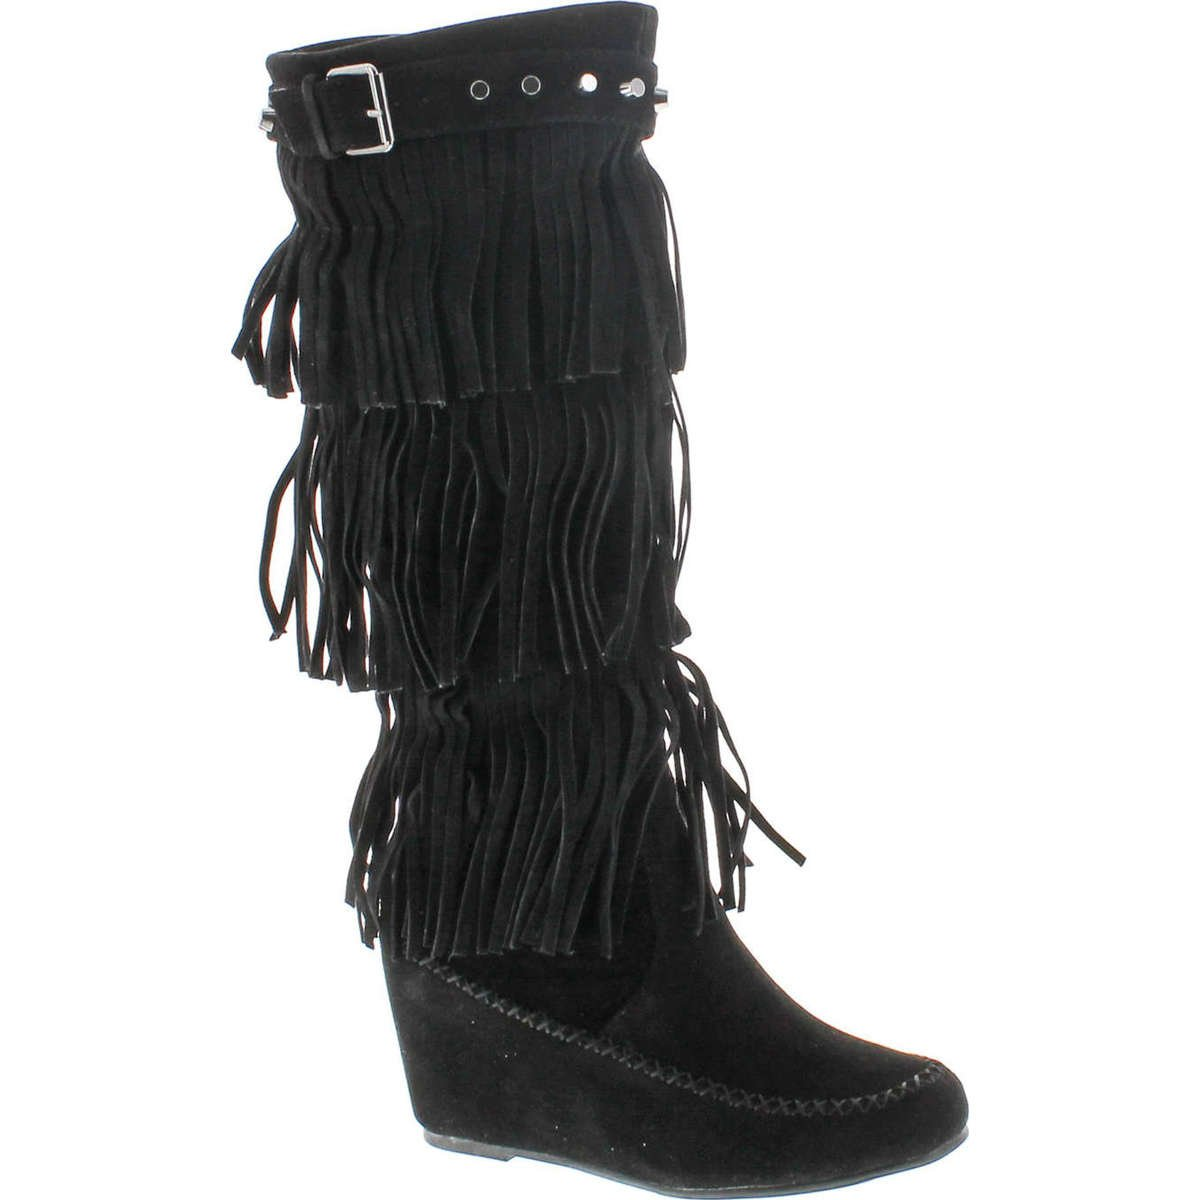 Nature Breeze Womens Bridget-02Hi Suede Fringe Studded Moccasin Knee High Wedge Boot,Black,8